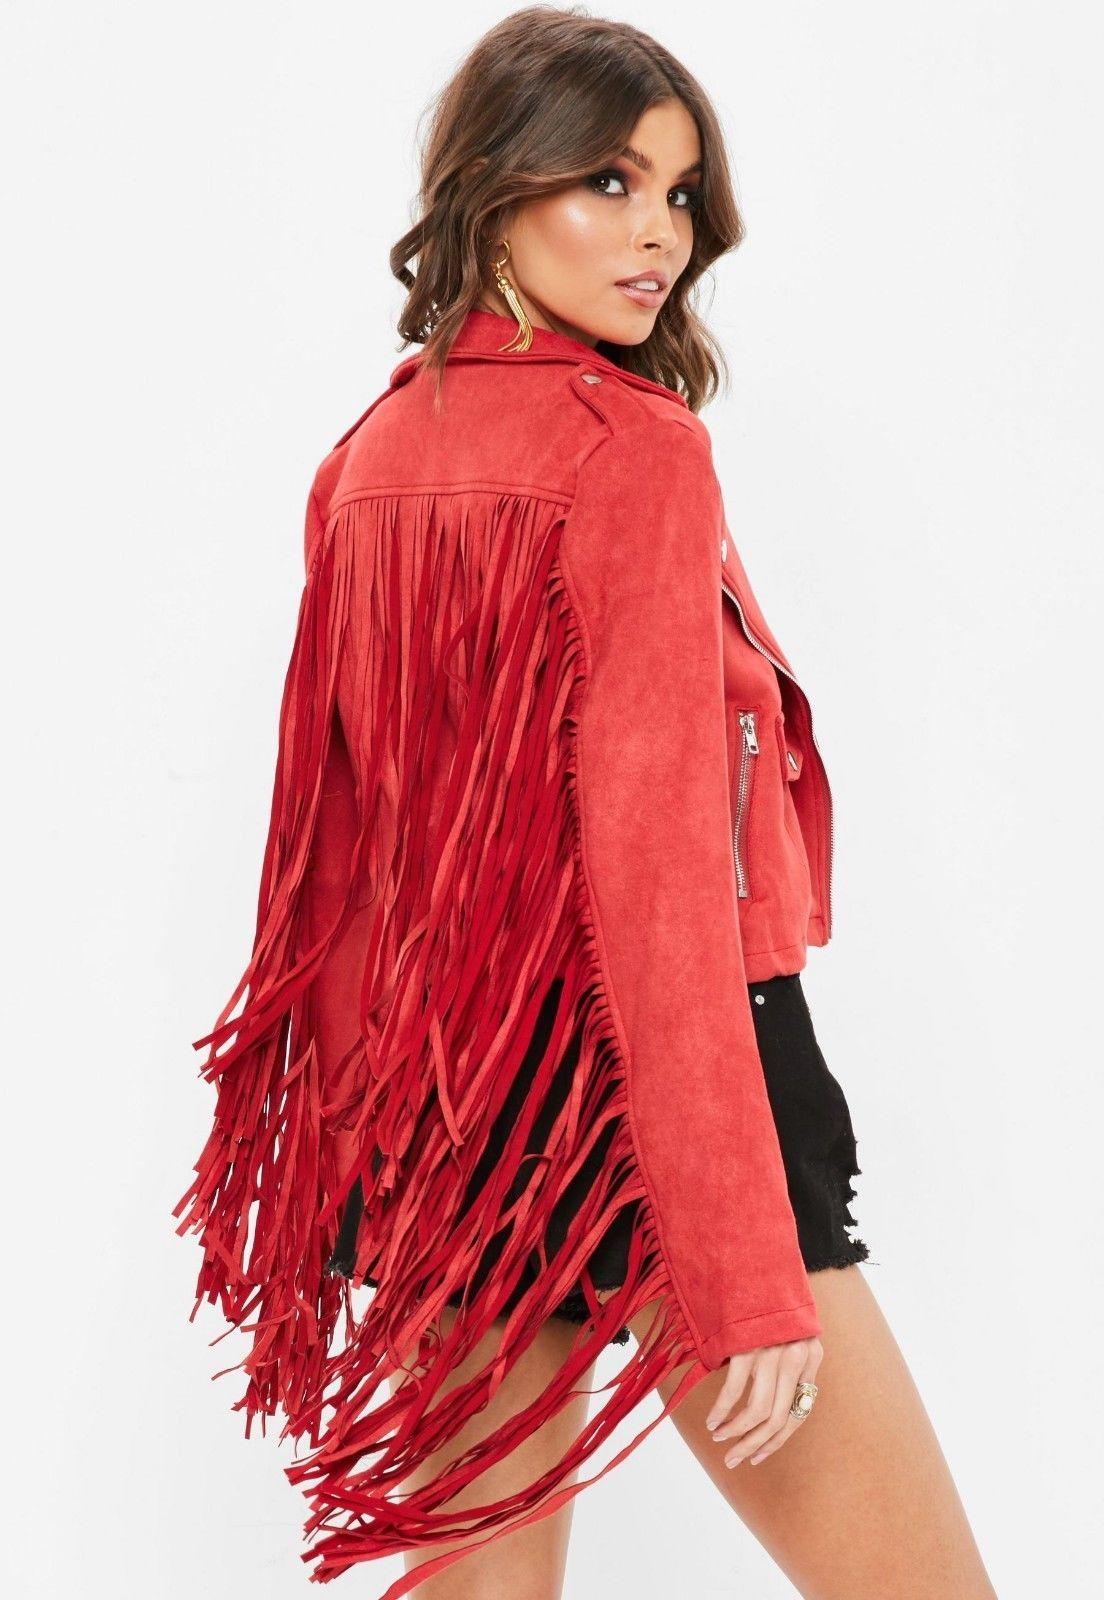 WOMEN'S NEW POPULAR RED WESTERN FRINGES SUEDE LEATHER BOHO HIPPY JACKET WJ125R